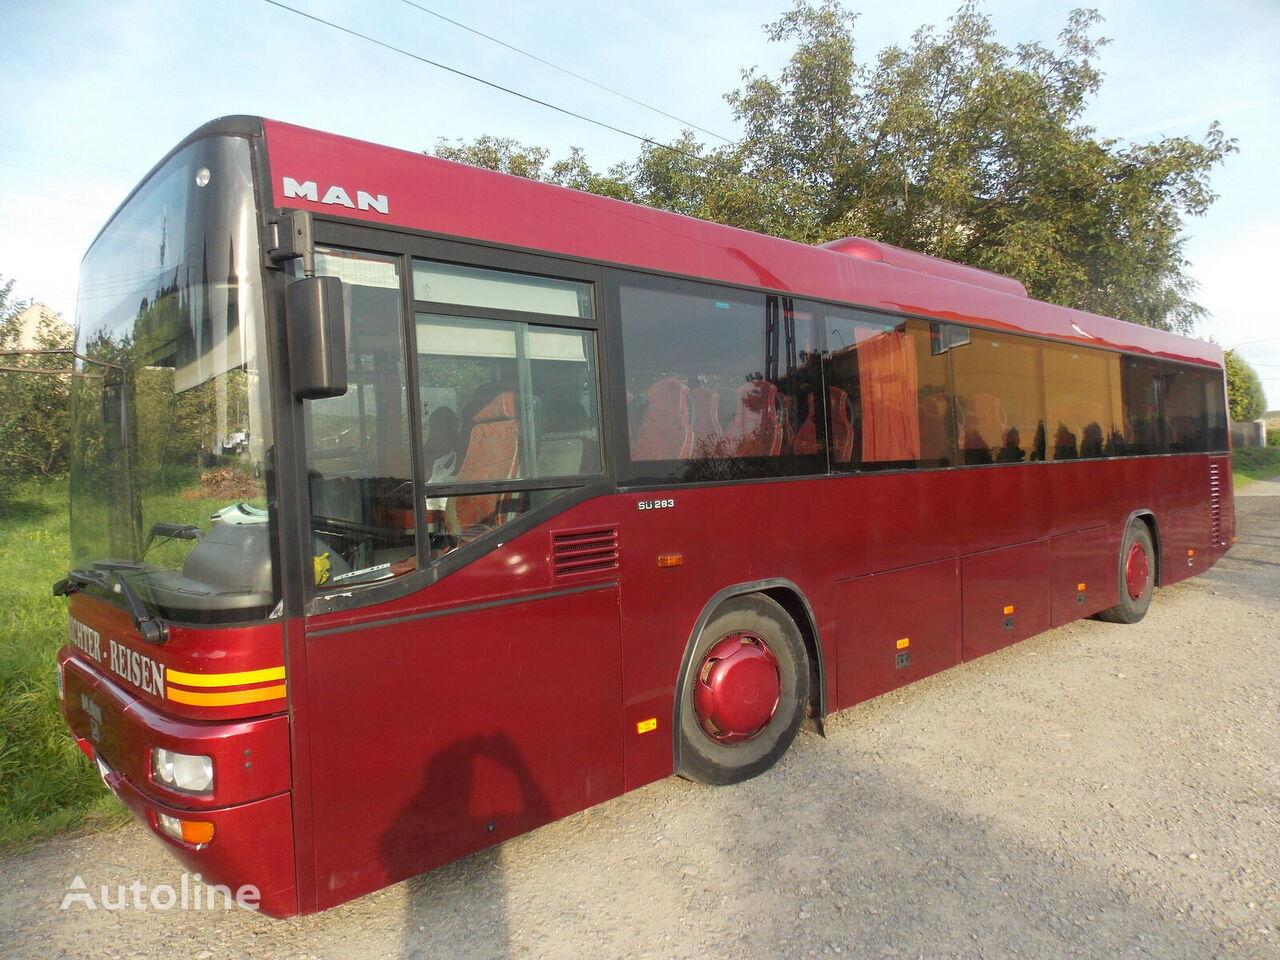 MAN SU 283 A72 263 Midi 469 prigradski autobus